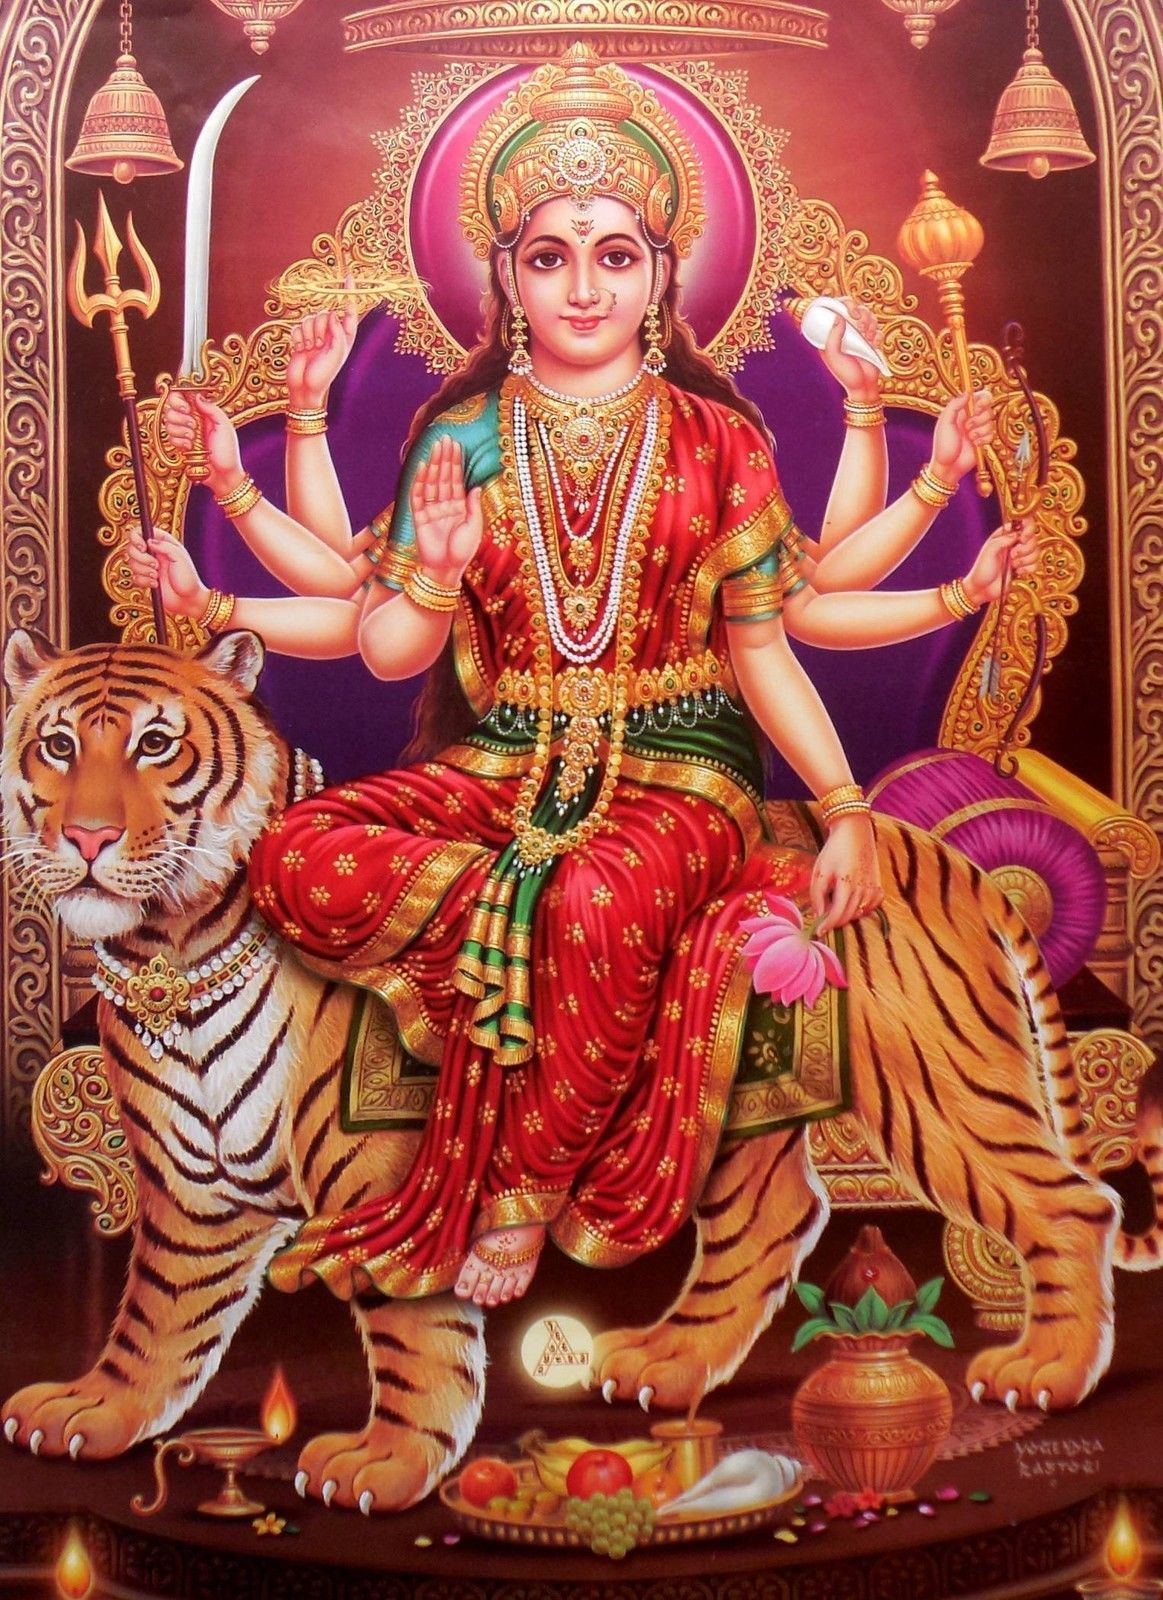 Pics of goddess durga